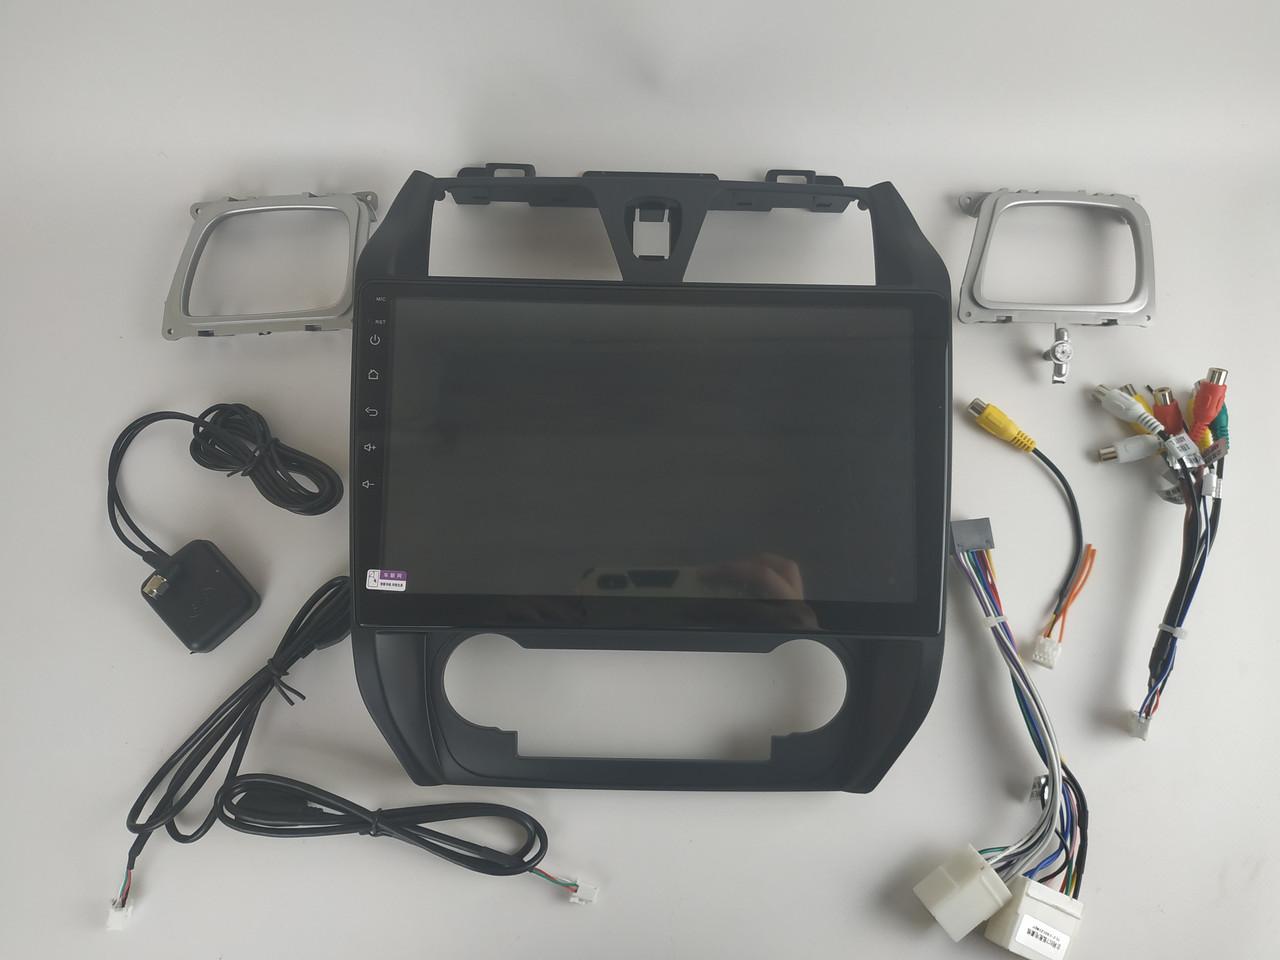 Штатная Android Магнитола на Geely Emgrand 7 2012-2015 Model P6/P8-solution (М-ДЖЕ-10-4Ж)